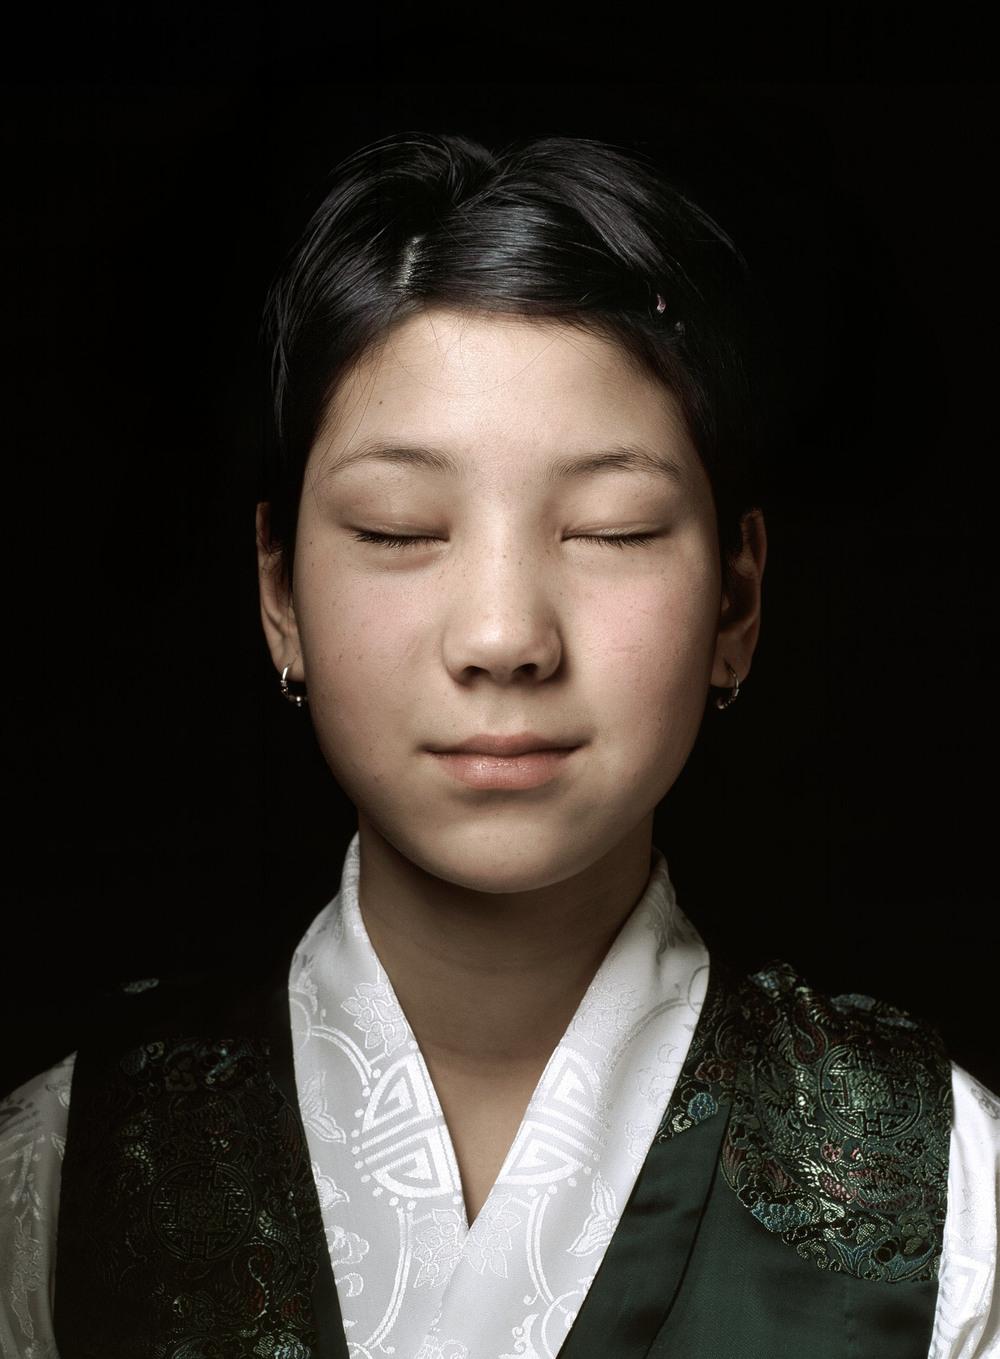 Tibeter Gemeinschaft Schweiz / Galbucci Werbung